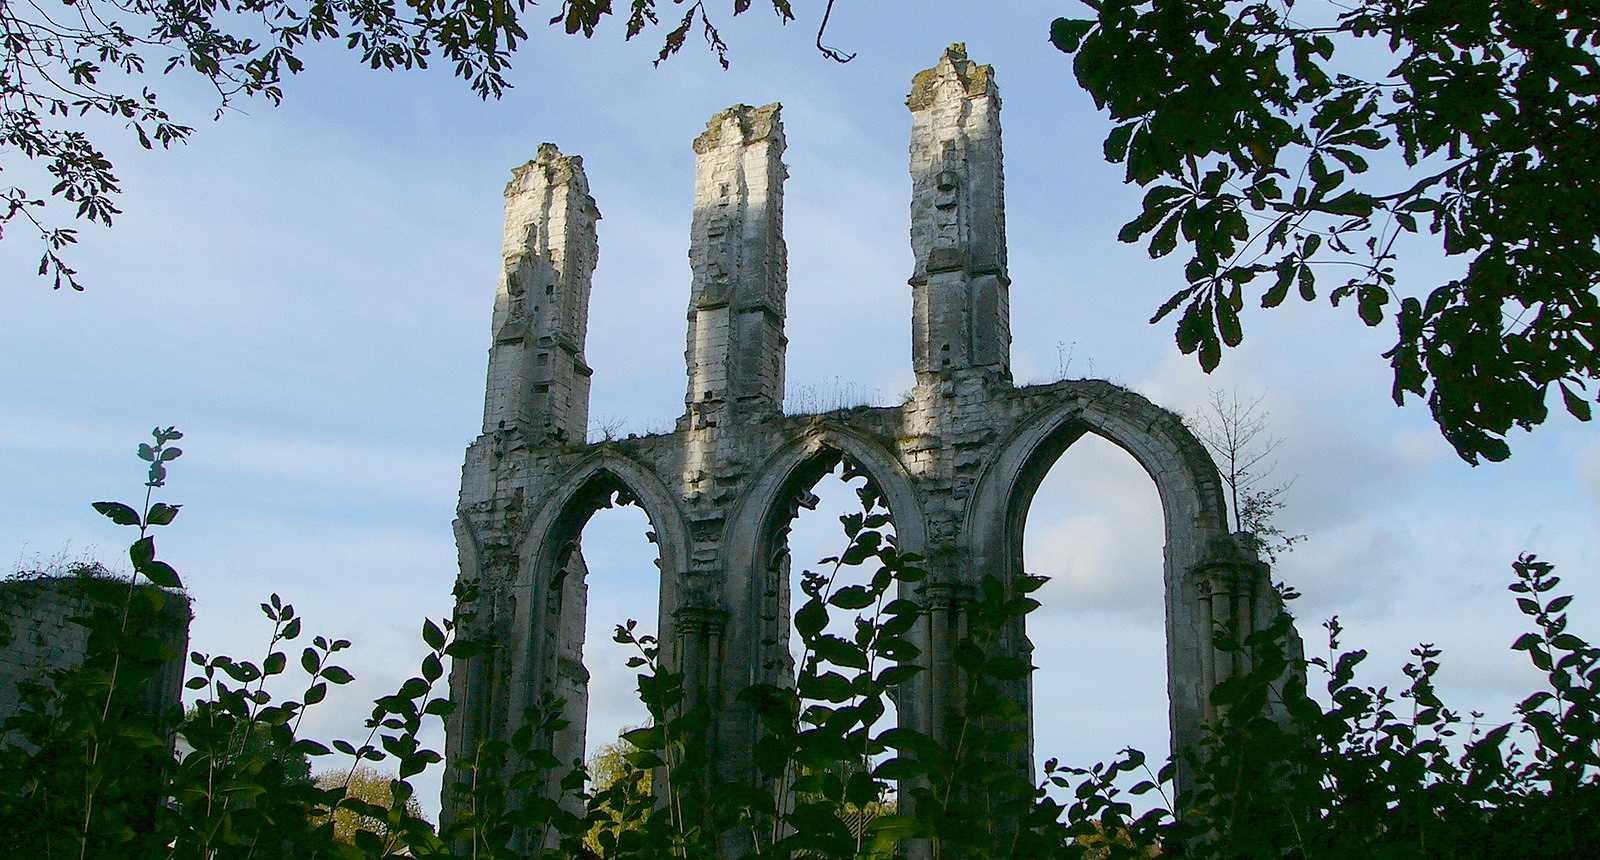 Ruines de l'Abbaye de Saint-Bertin à Saint-Omer